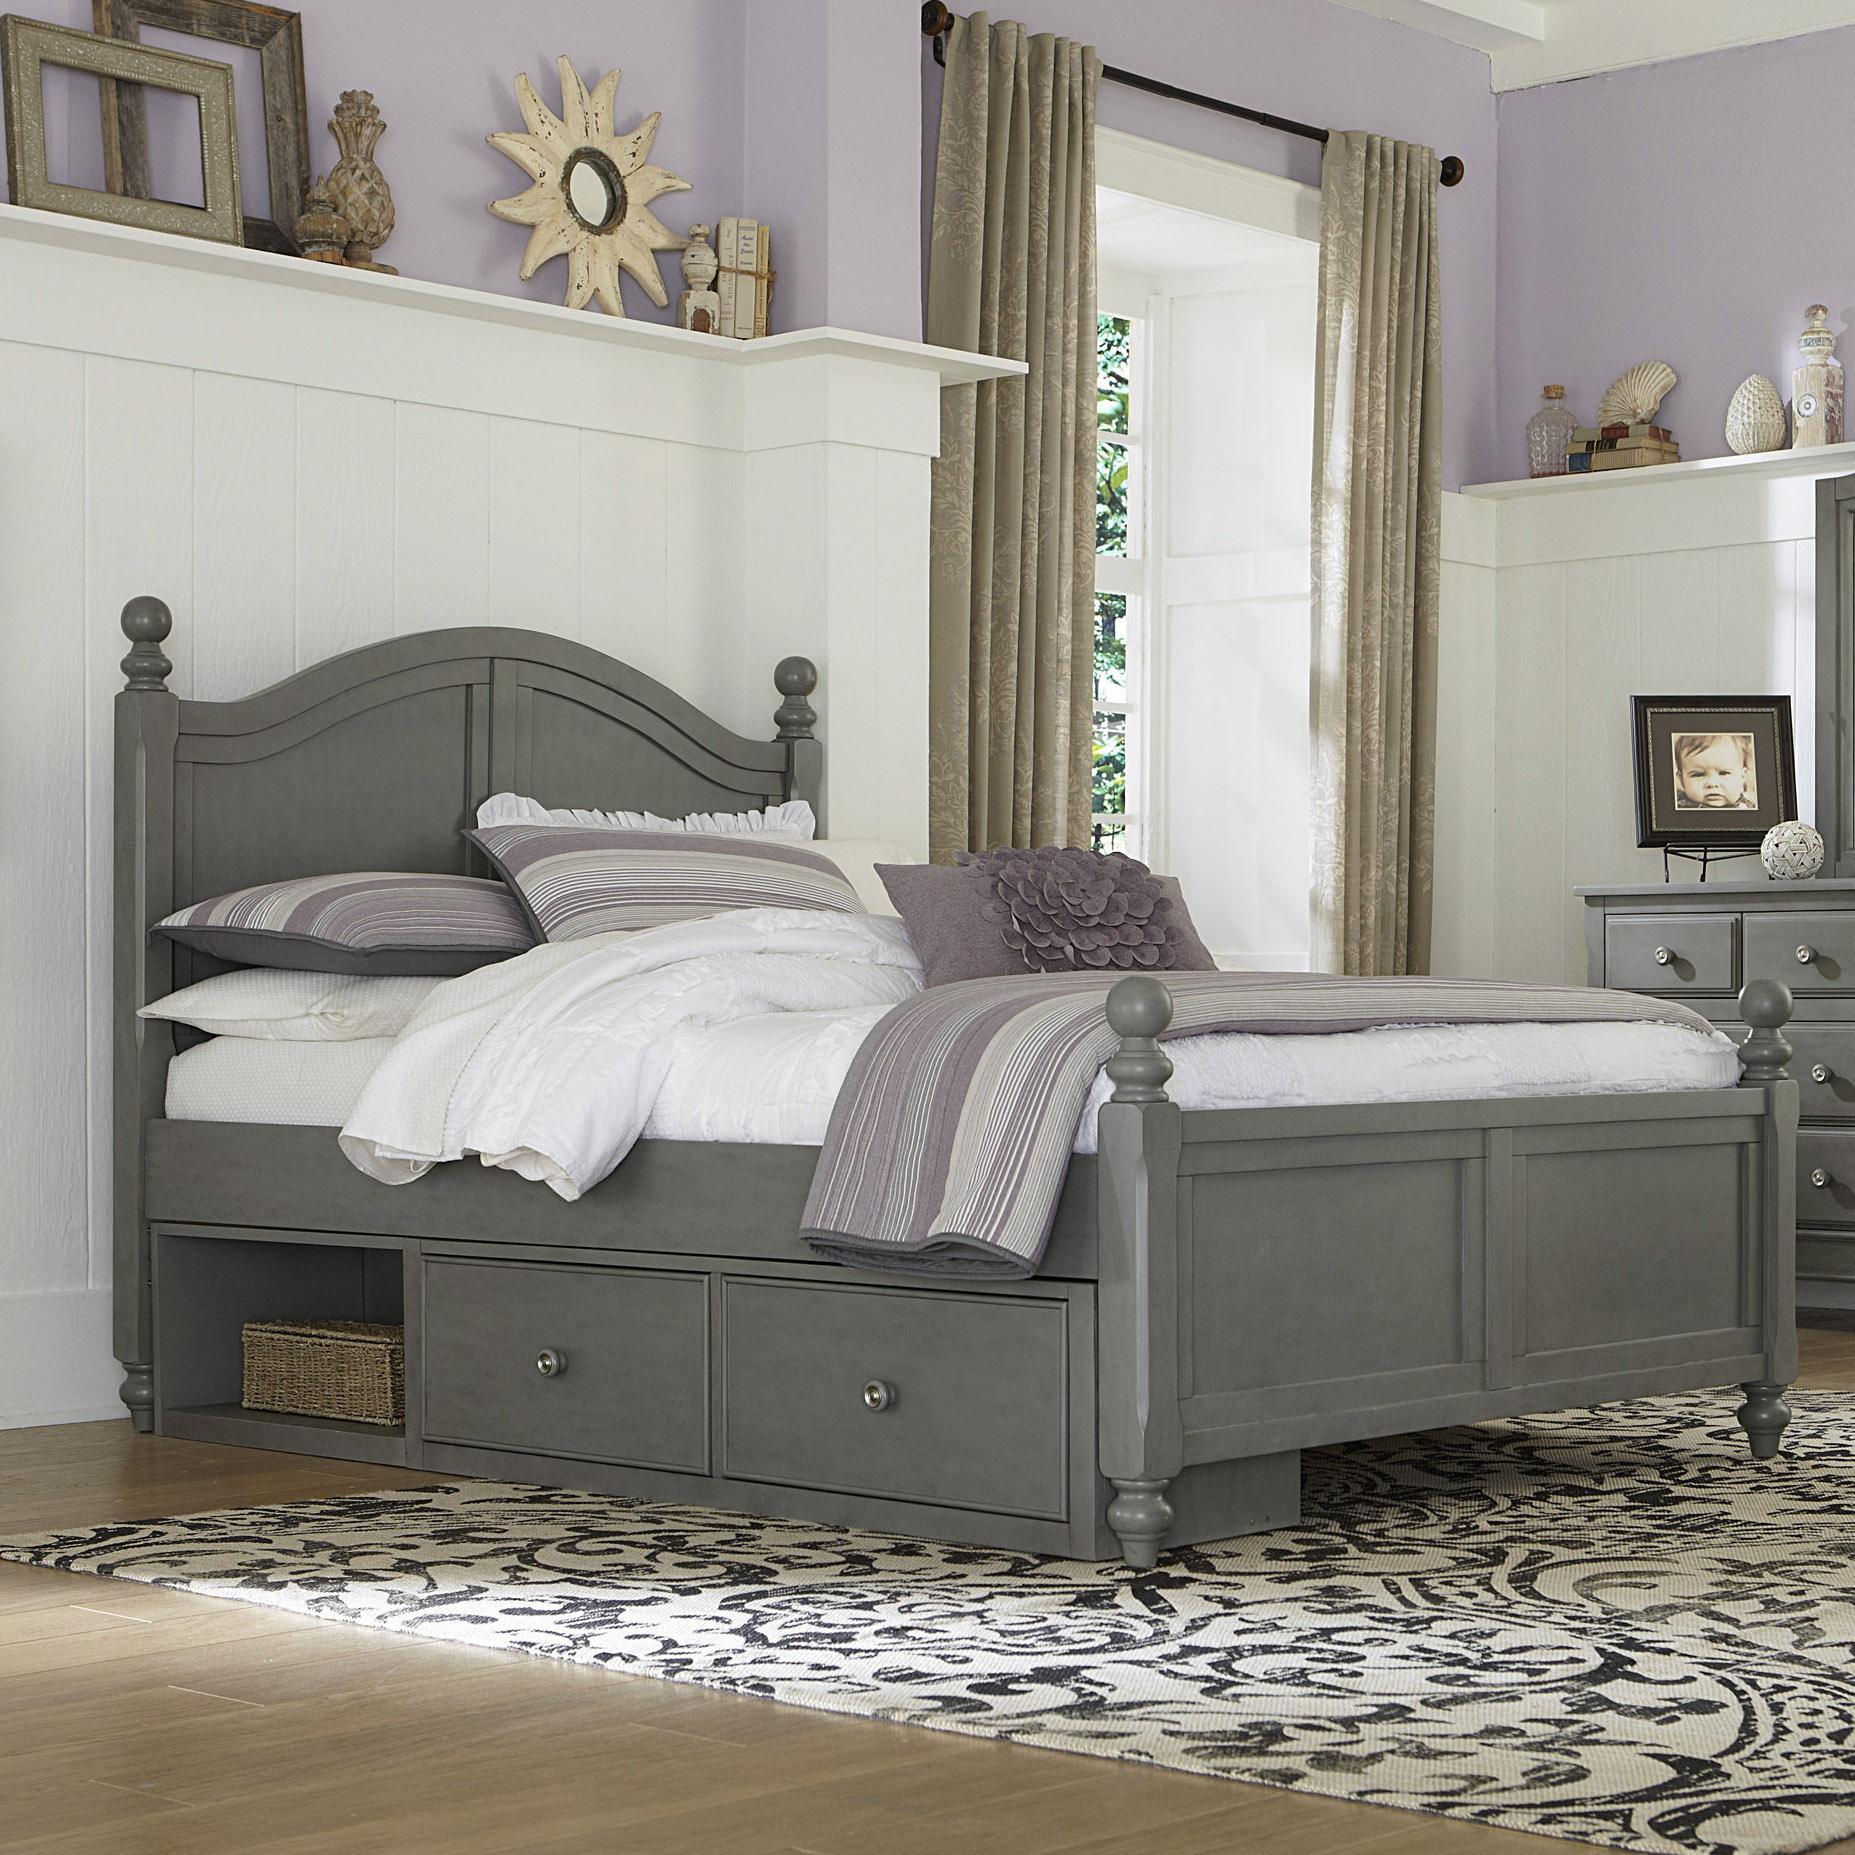 Lake House Full Payton (Arch) Bed + Storage Unit by NE Kids at Furniture Barn